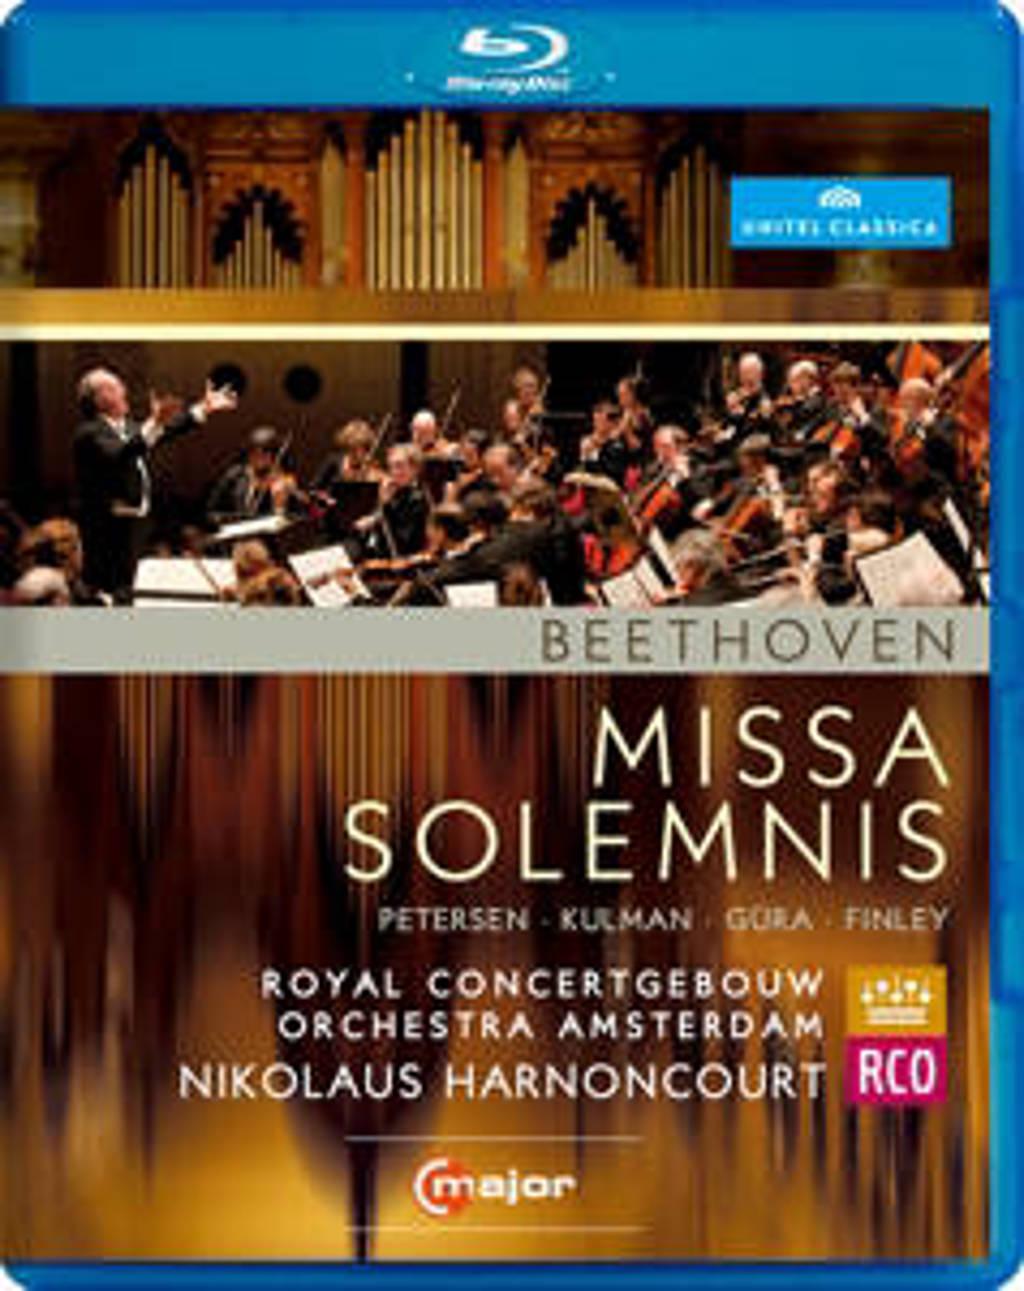 Petersen,Kulman,Gura - Missa Solemnis, Amsterdam 2012 (Blu-ray)